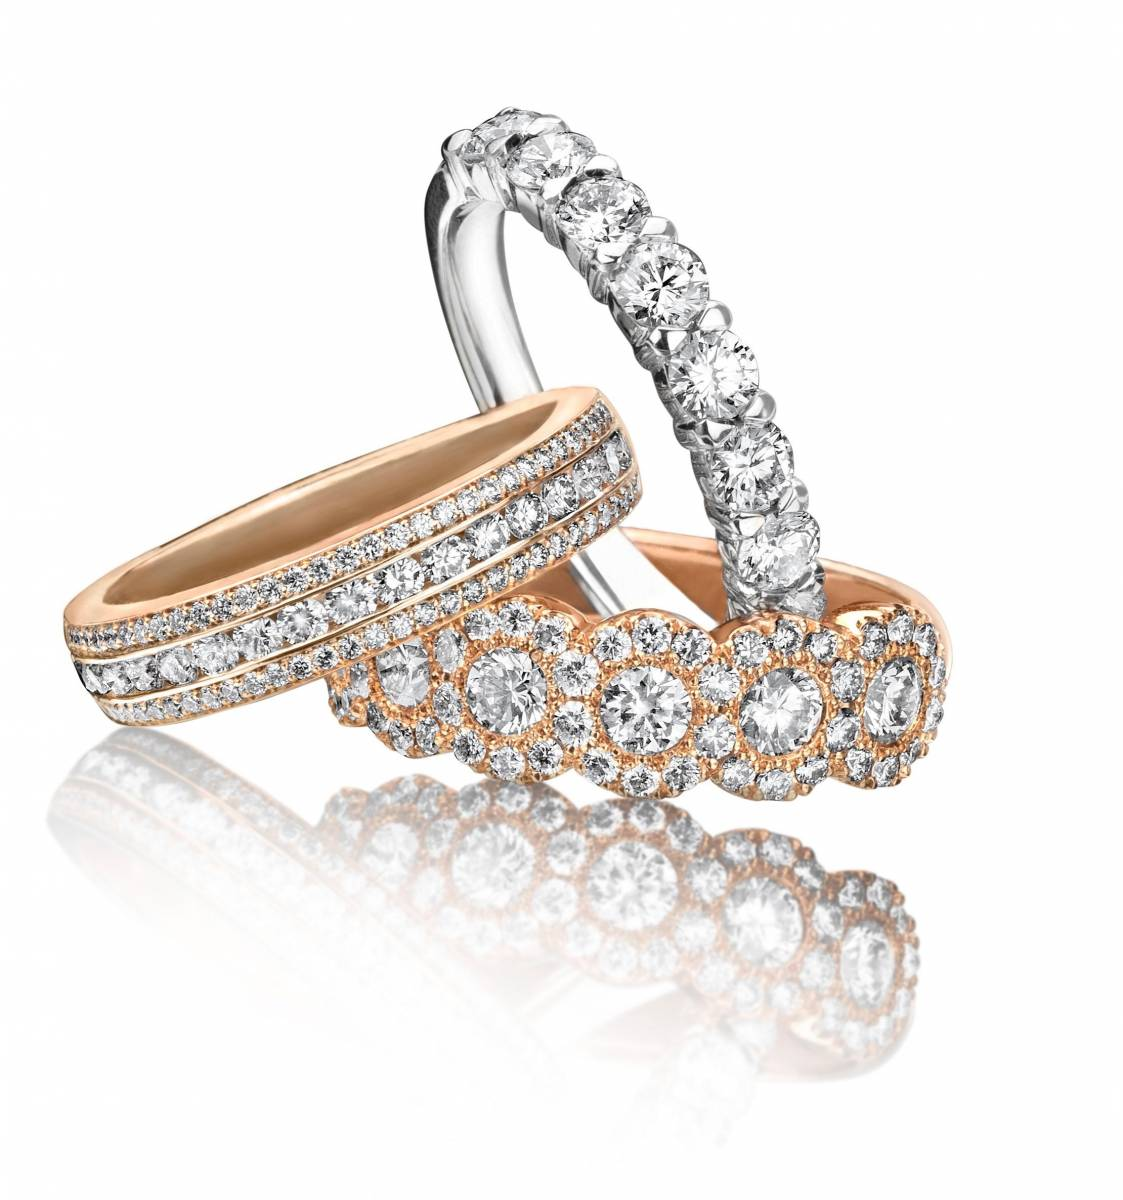 Juwelier Vandromme - Bruidsjuwelen - Juwelen - trouwring - verlovingsring - House of Weddings - 12